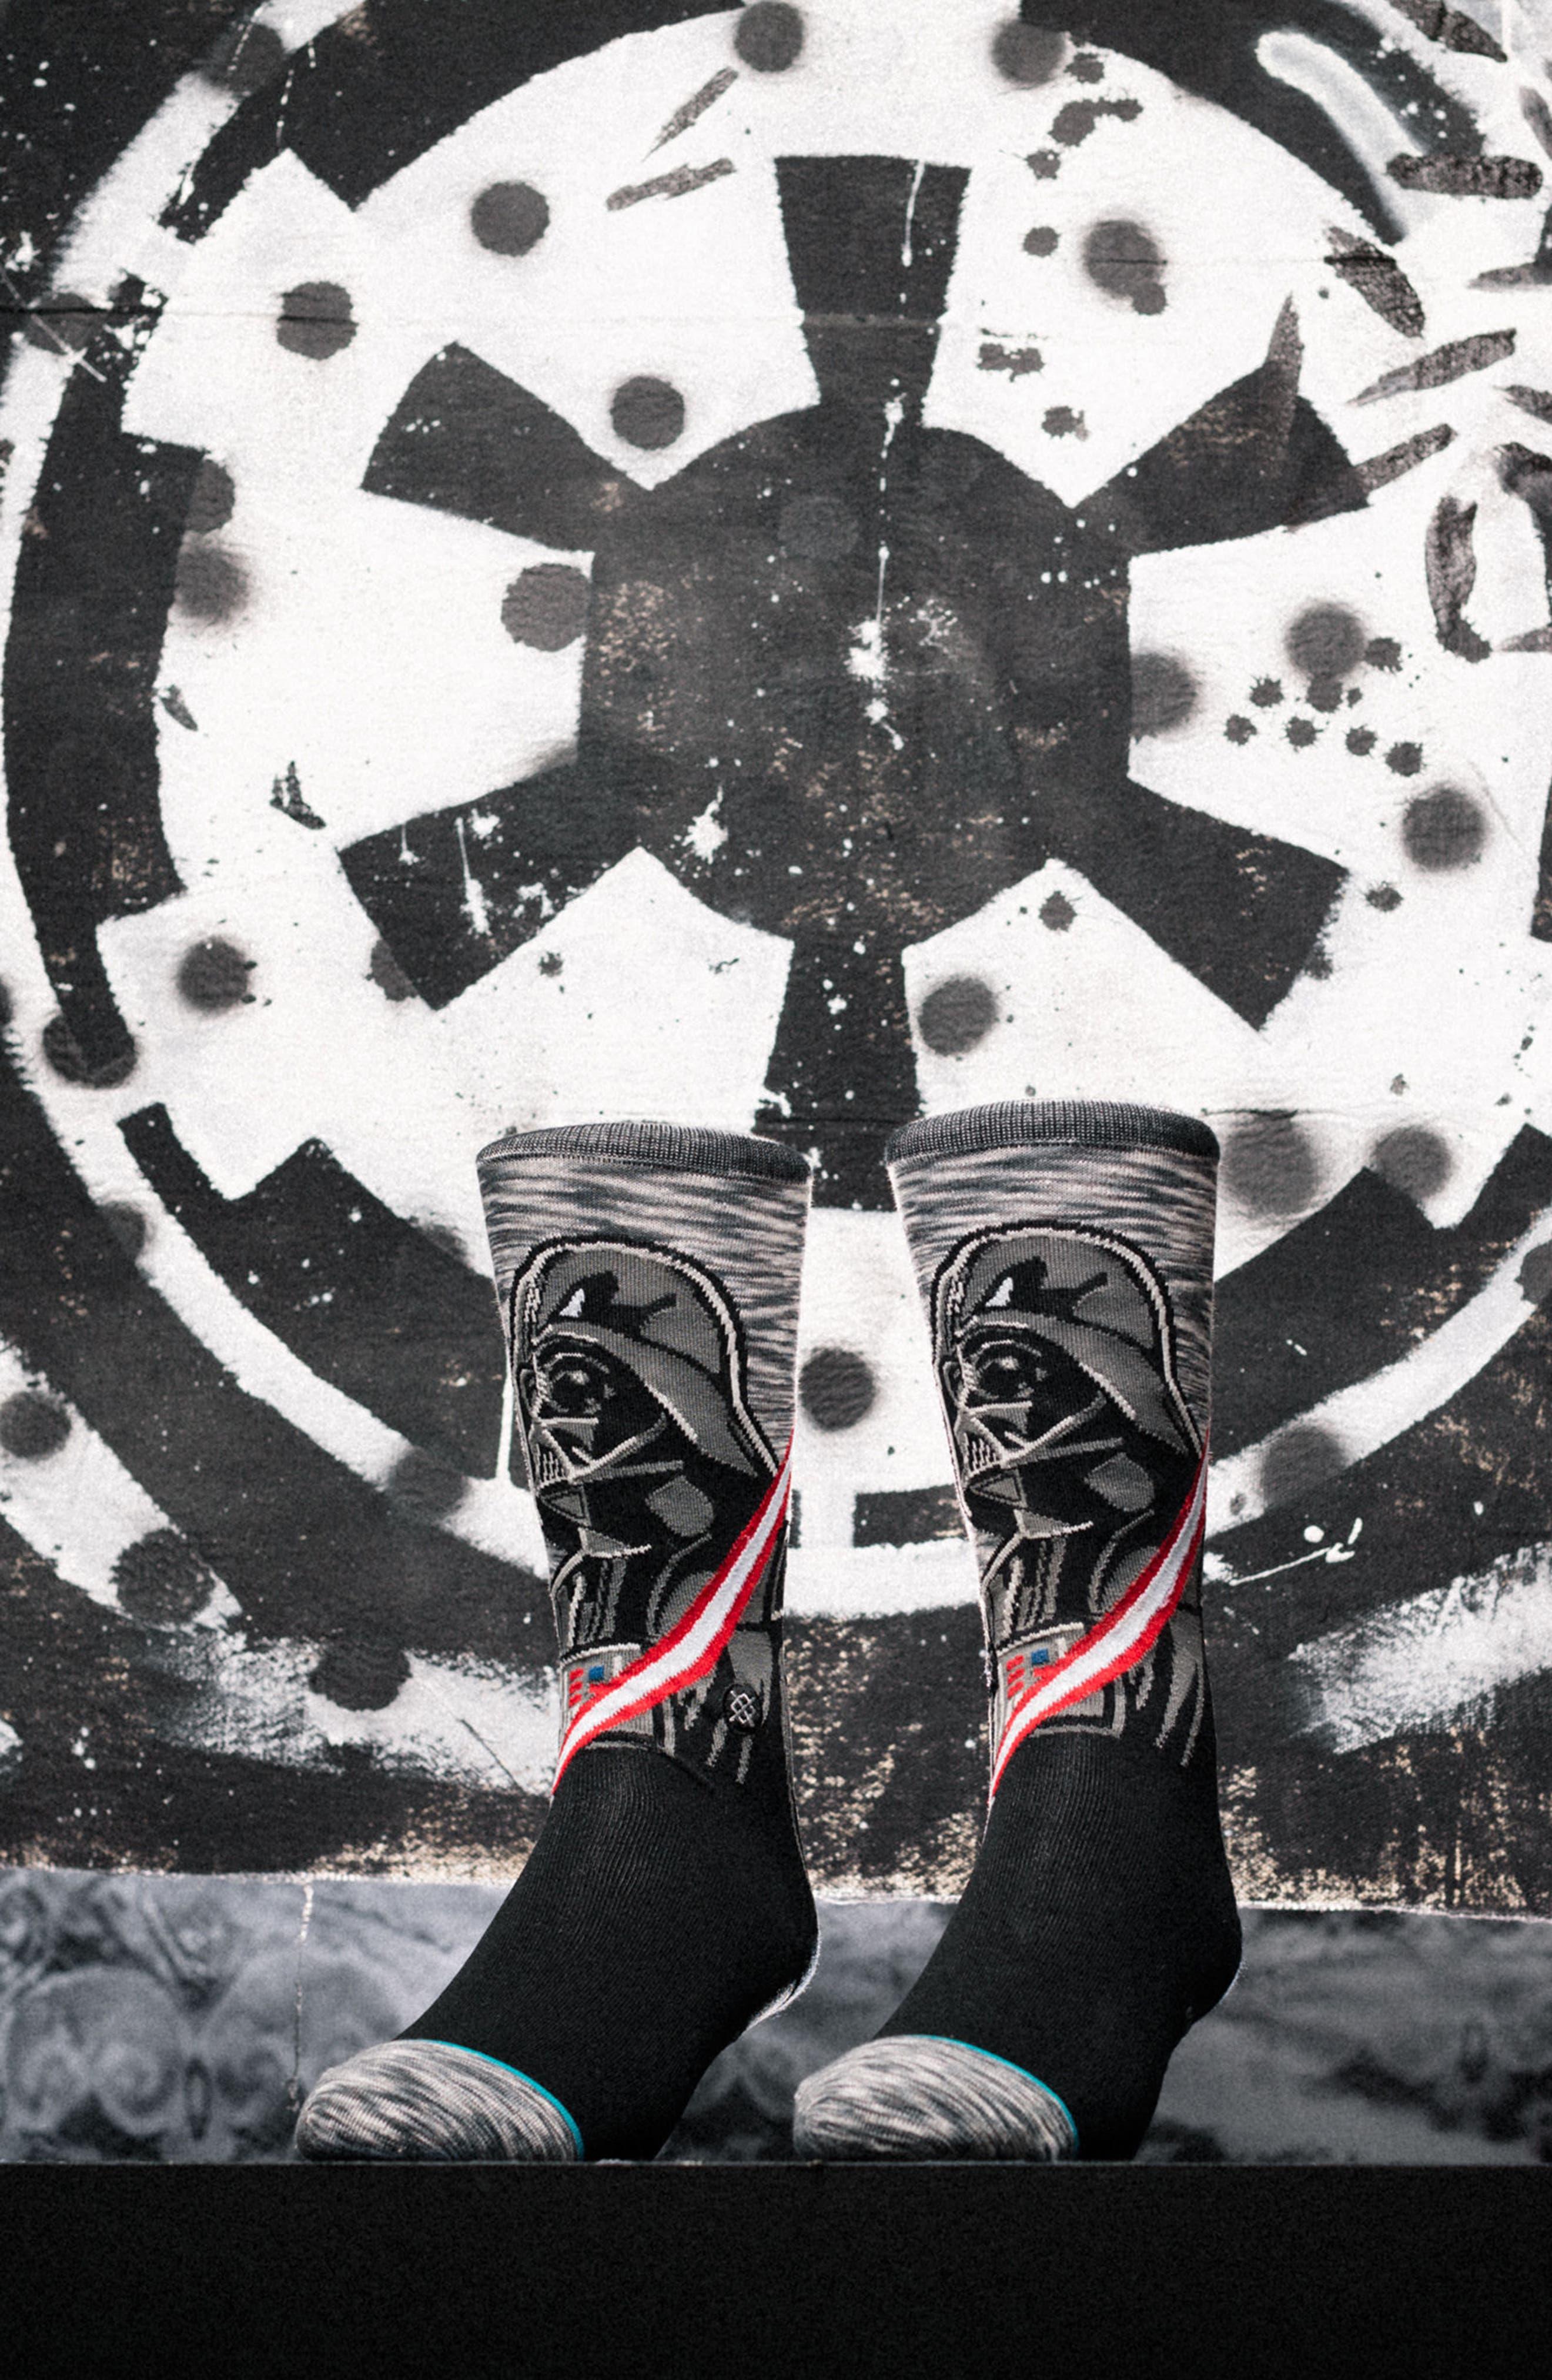 Star Wars<sup>™</sup> - Darkside Socks,                             Alternate thumbnail 2, color,                             Grey